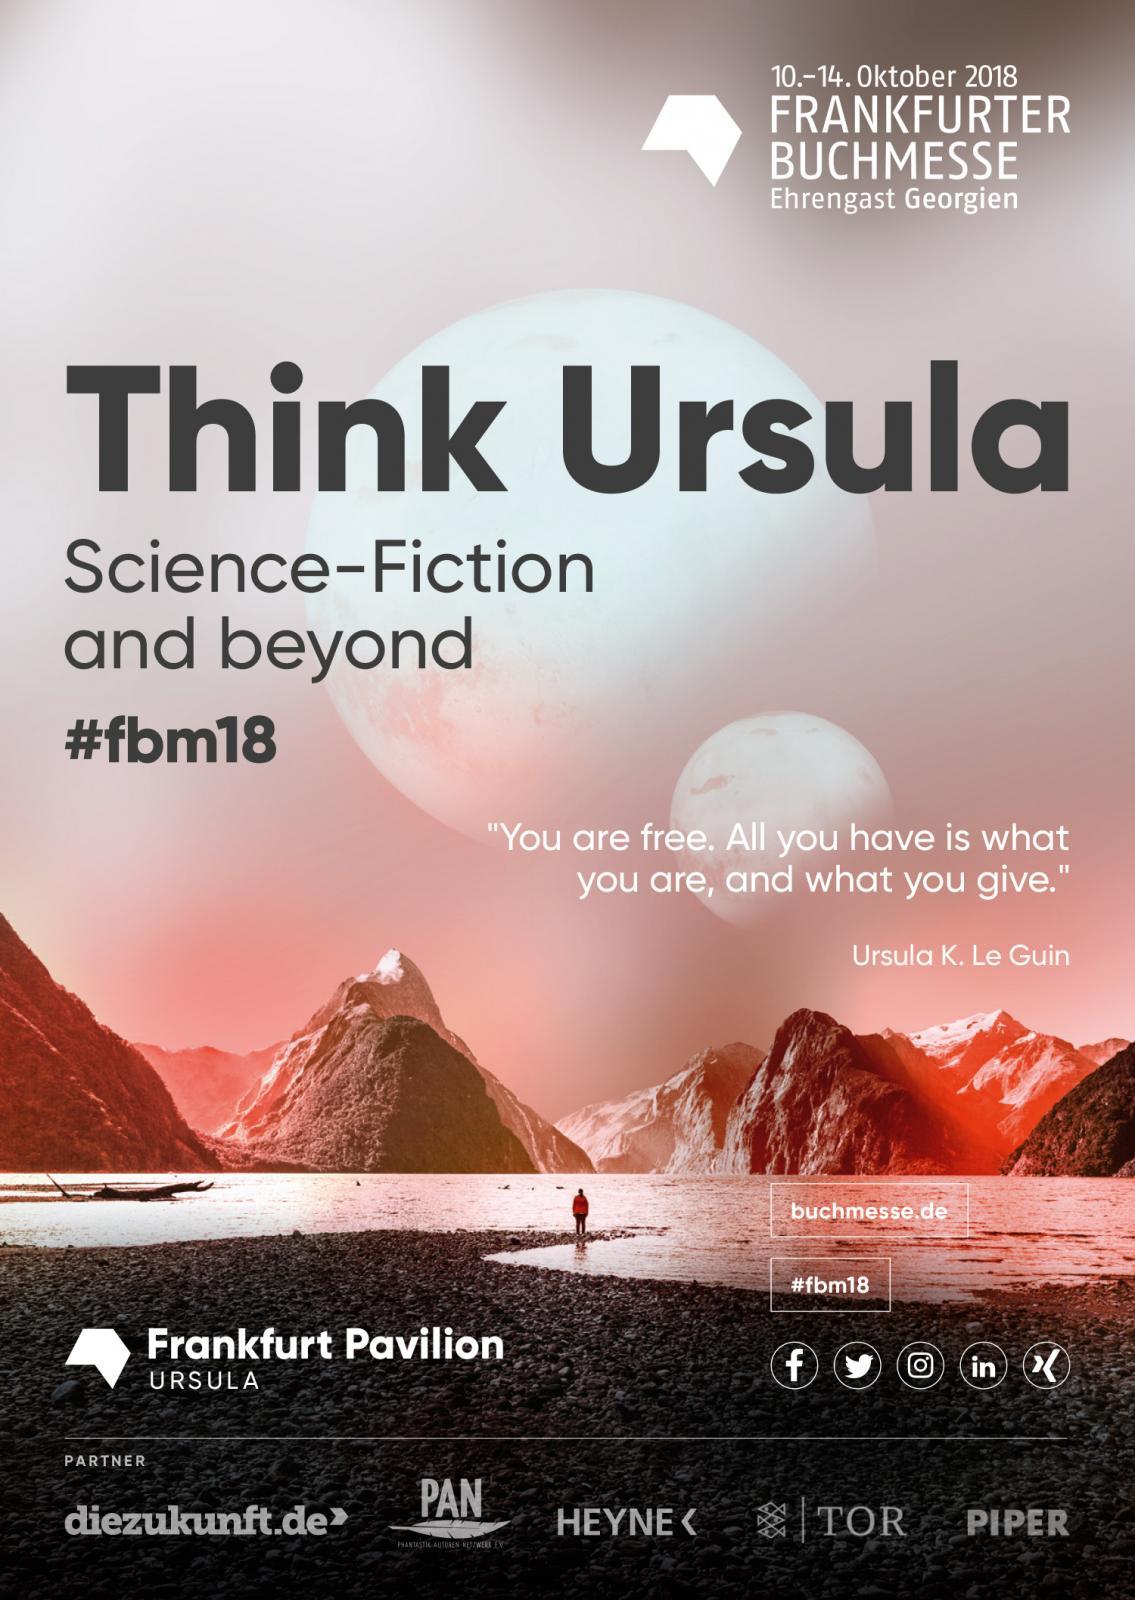 Think Ursula